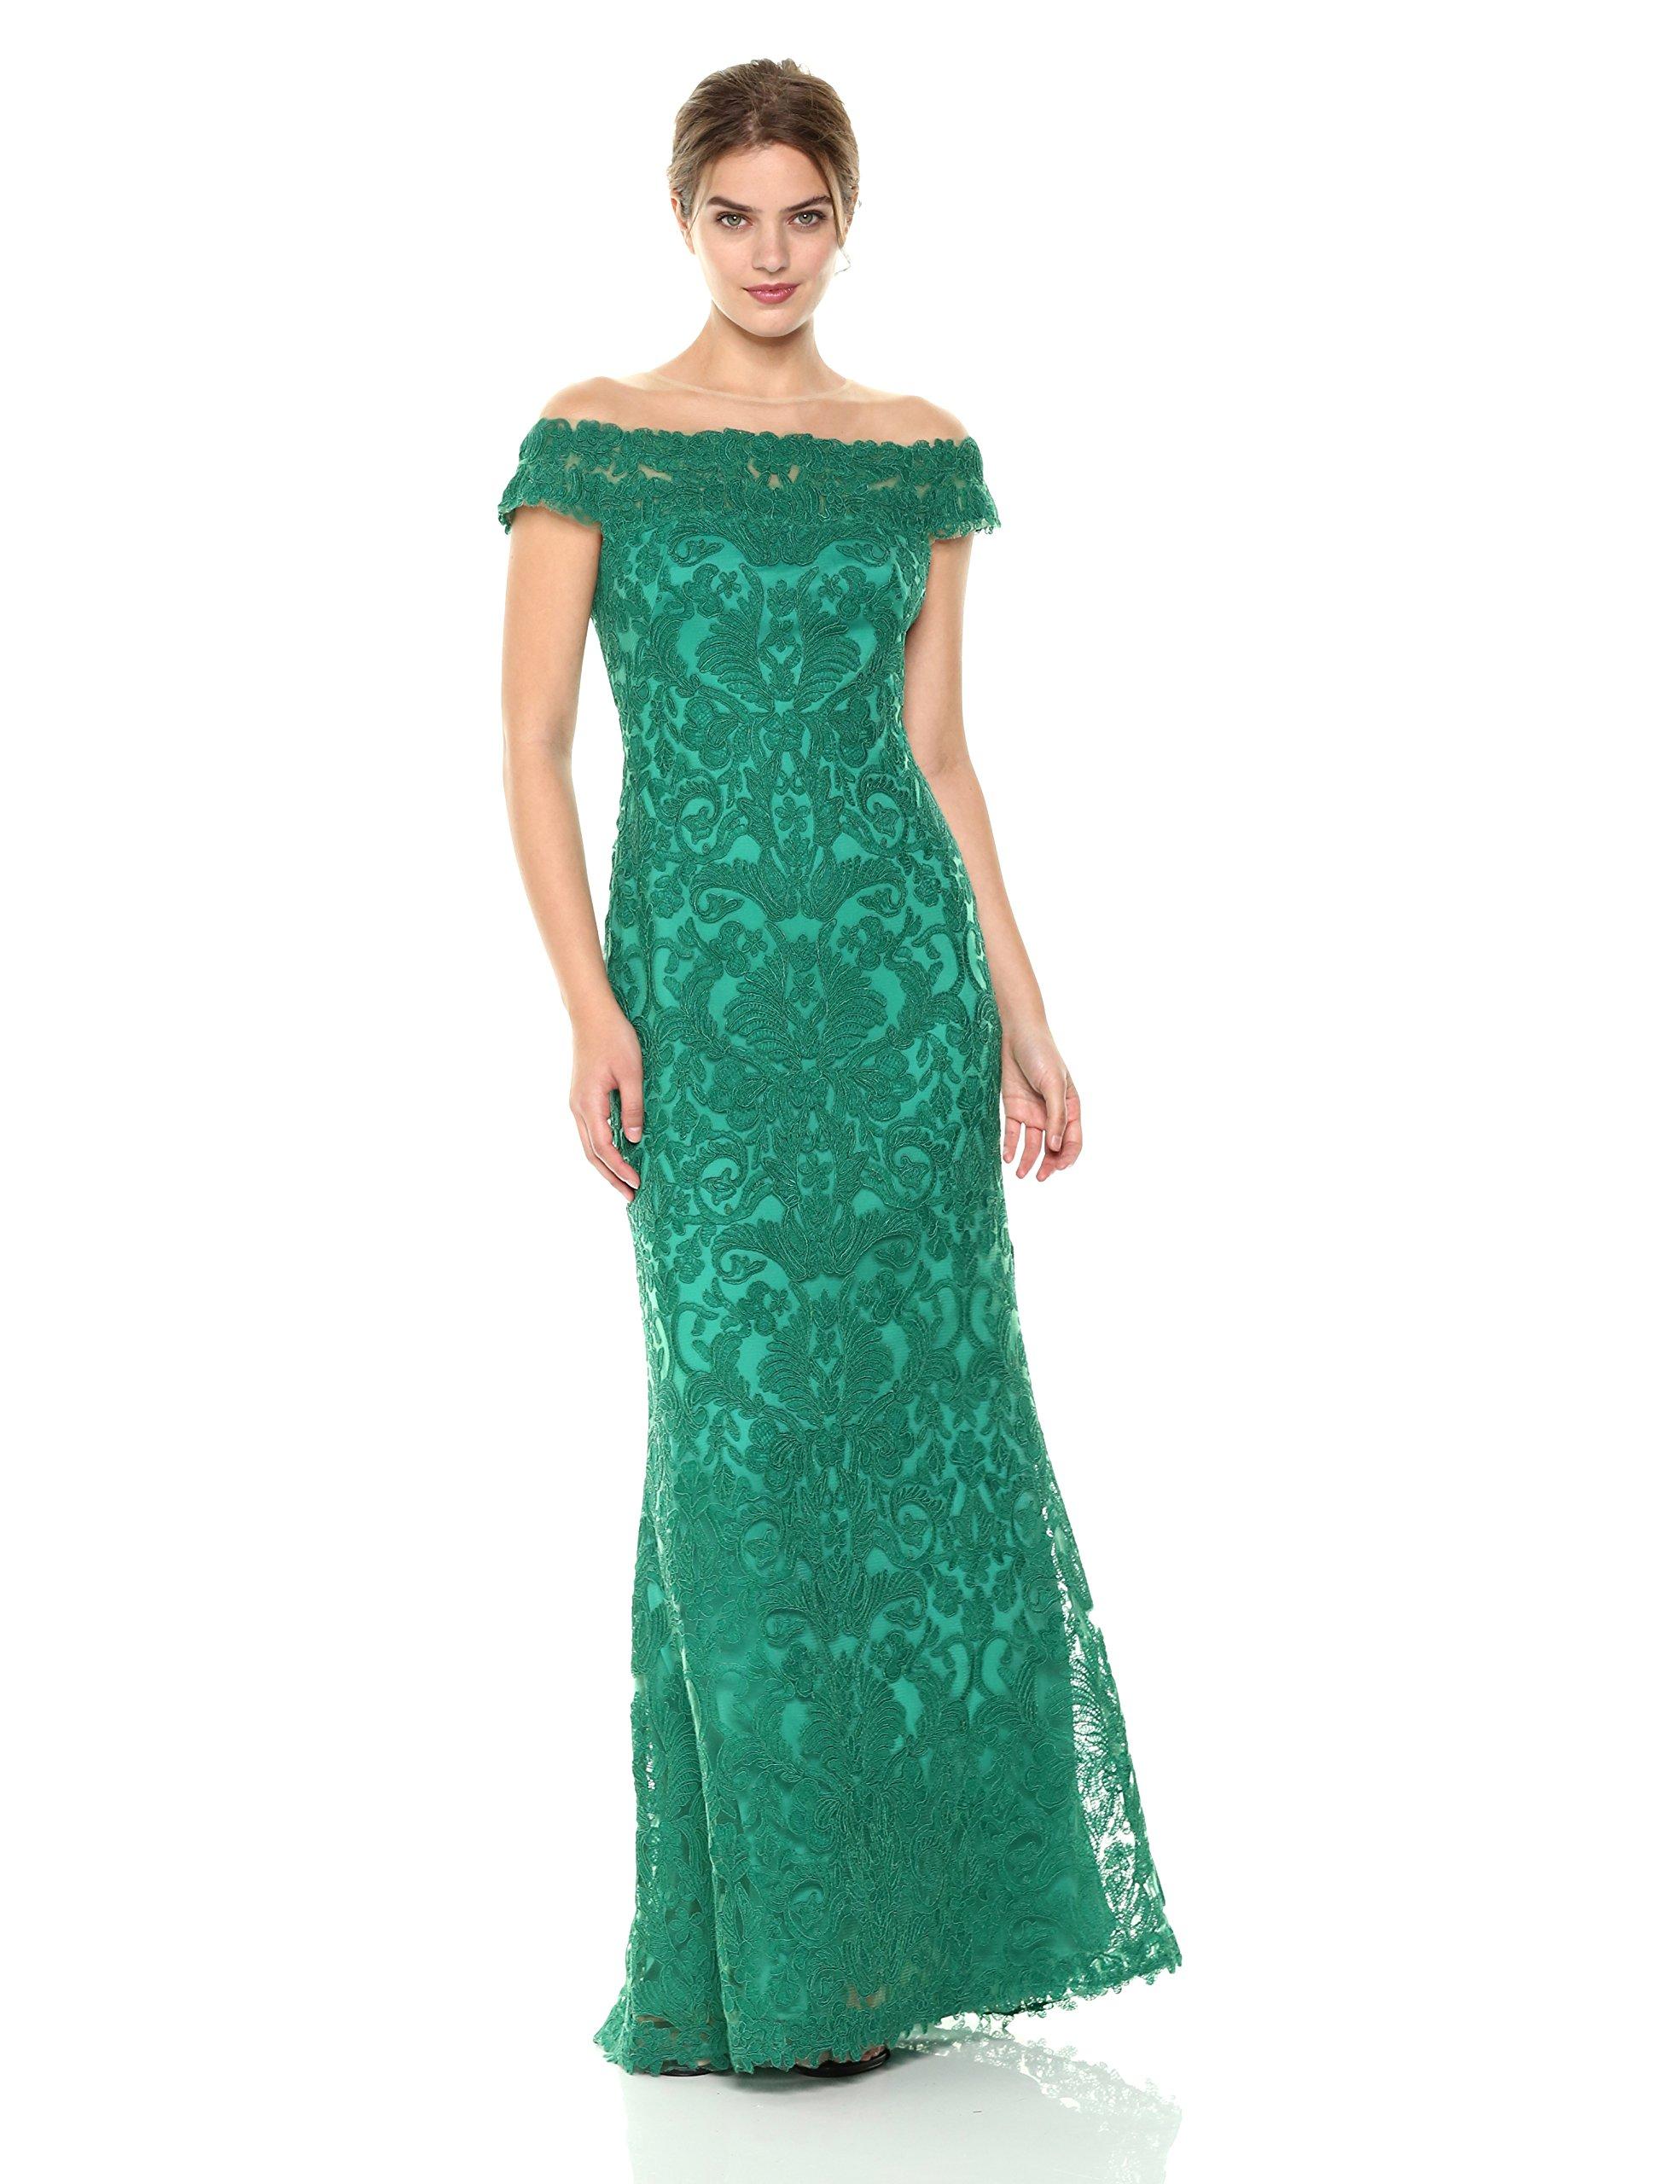 Tadashi Shoji Women's Illusion Neck Lace Gown, Deep Emerald, 4